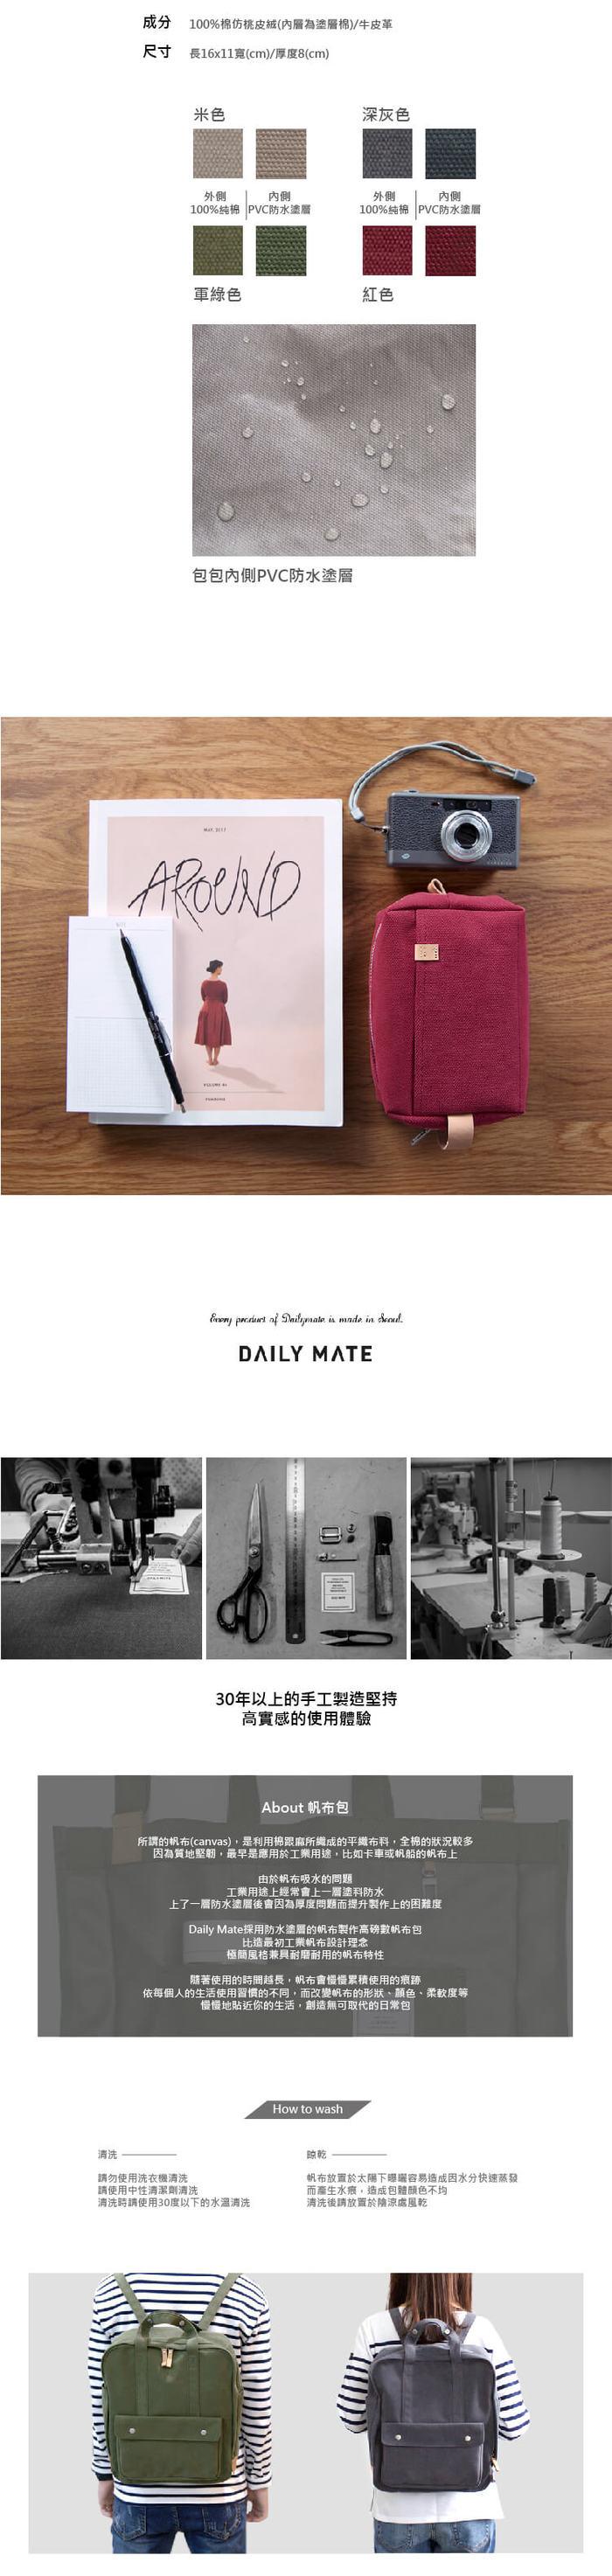 Daily mate|萬用化妝包(米色)